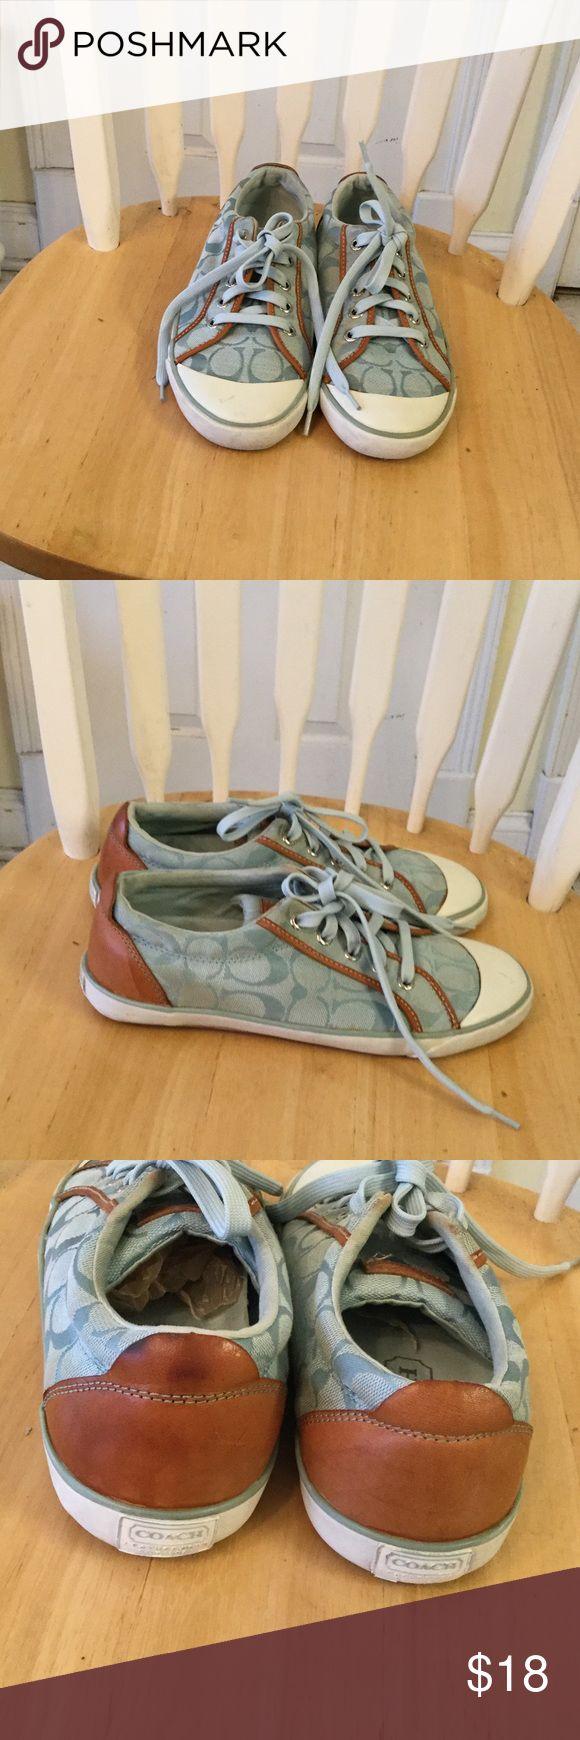 coach sneakers Light blue Signature coach sneaker Coach Shoes Sneakers